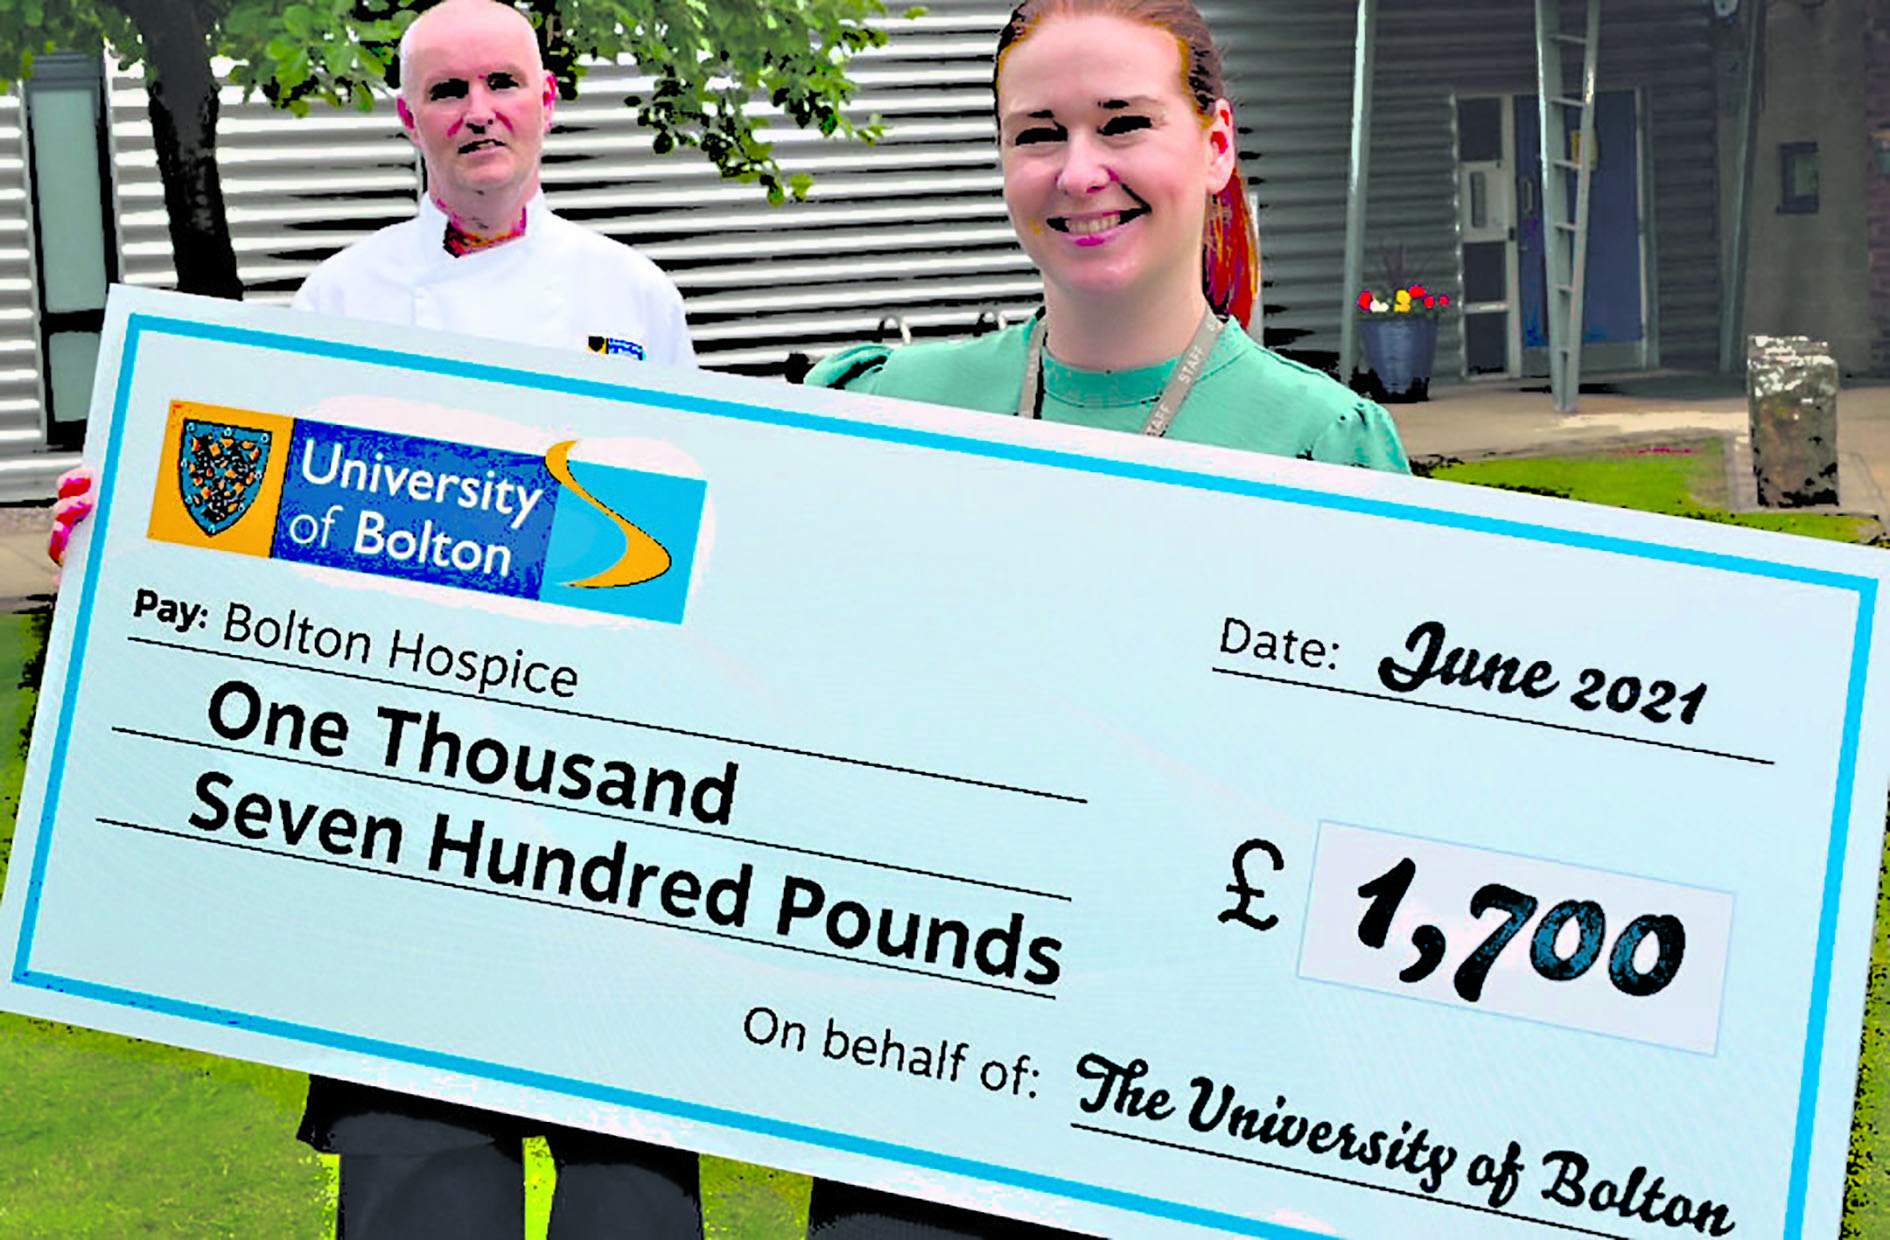 University's hospice boost